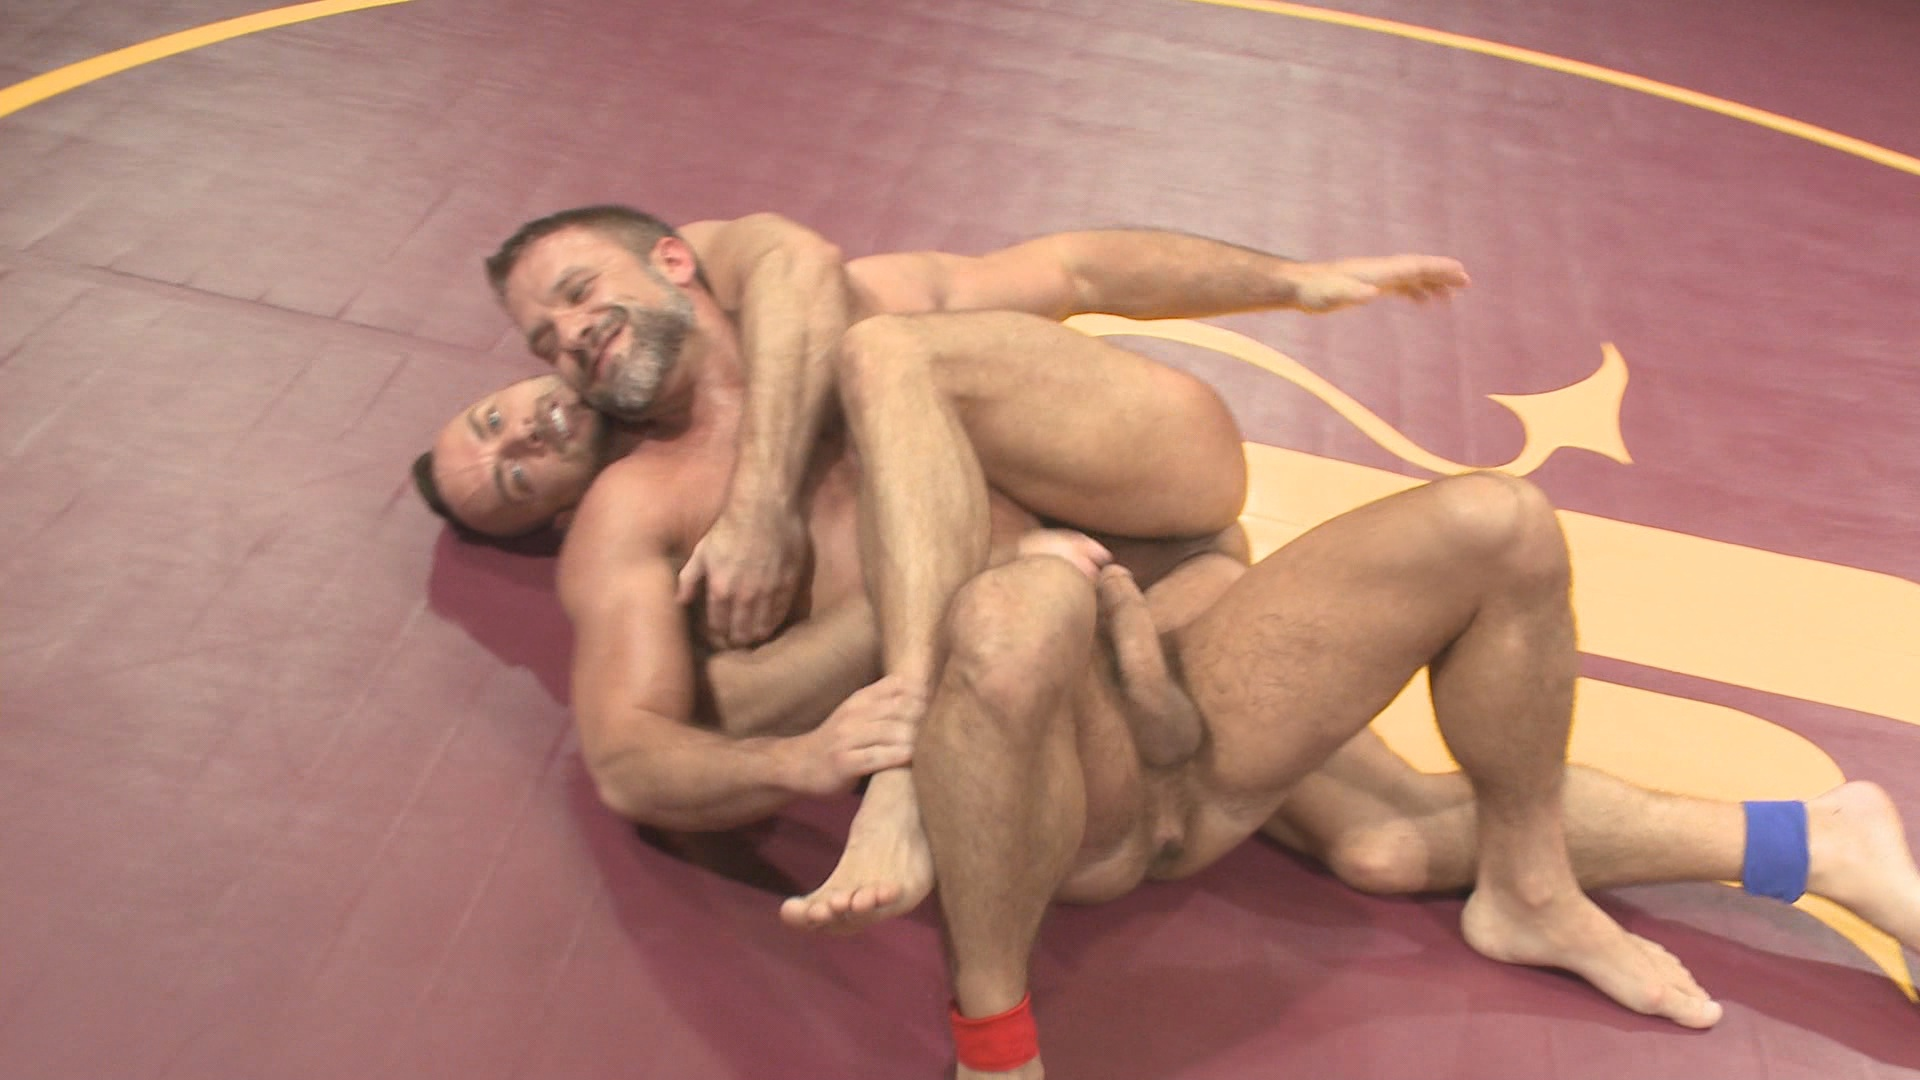 Naked Wrestling Videos